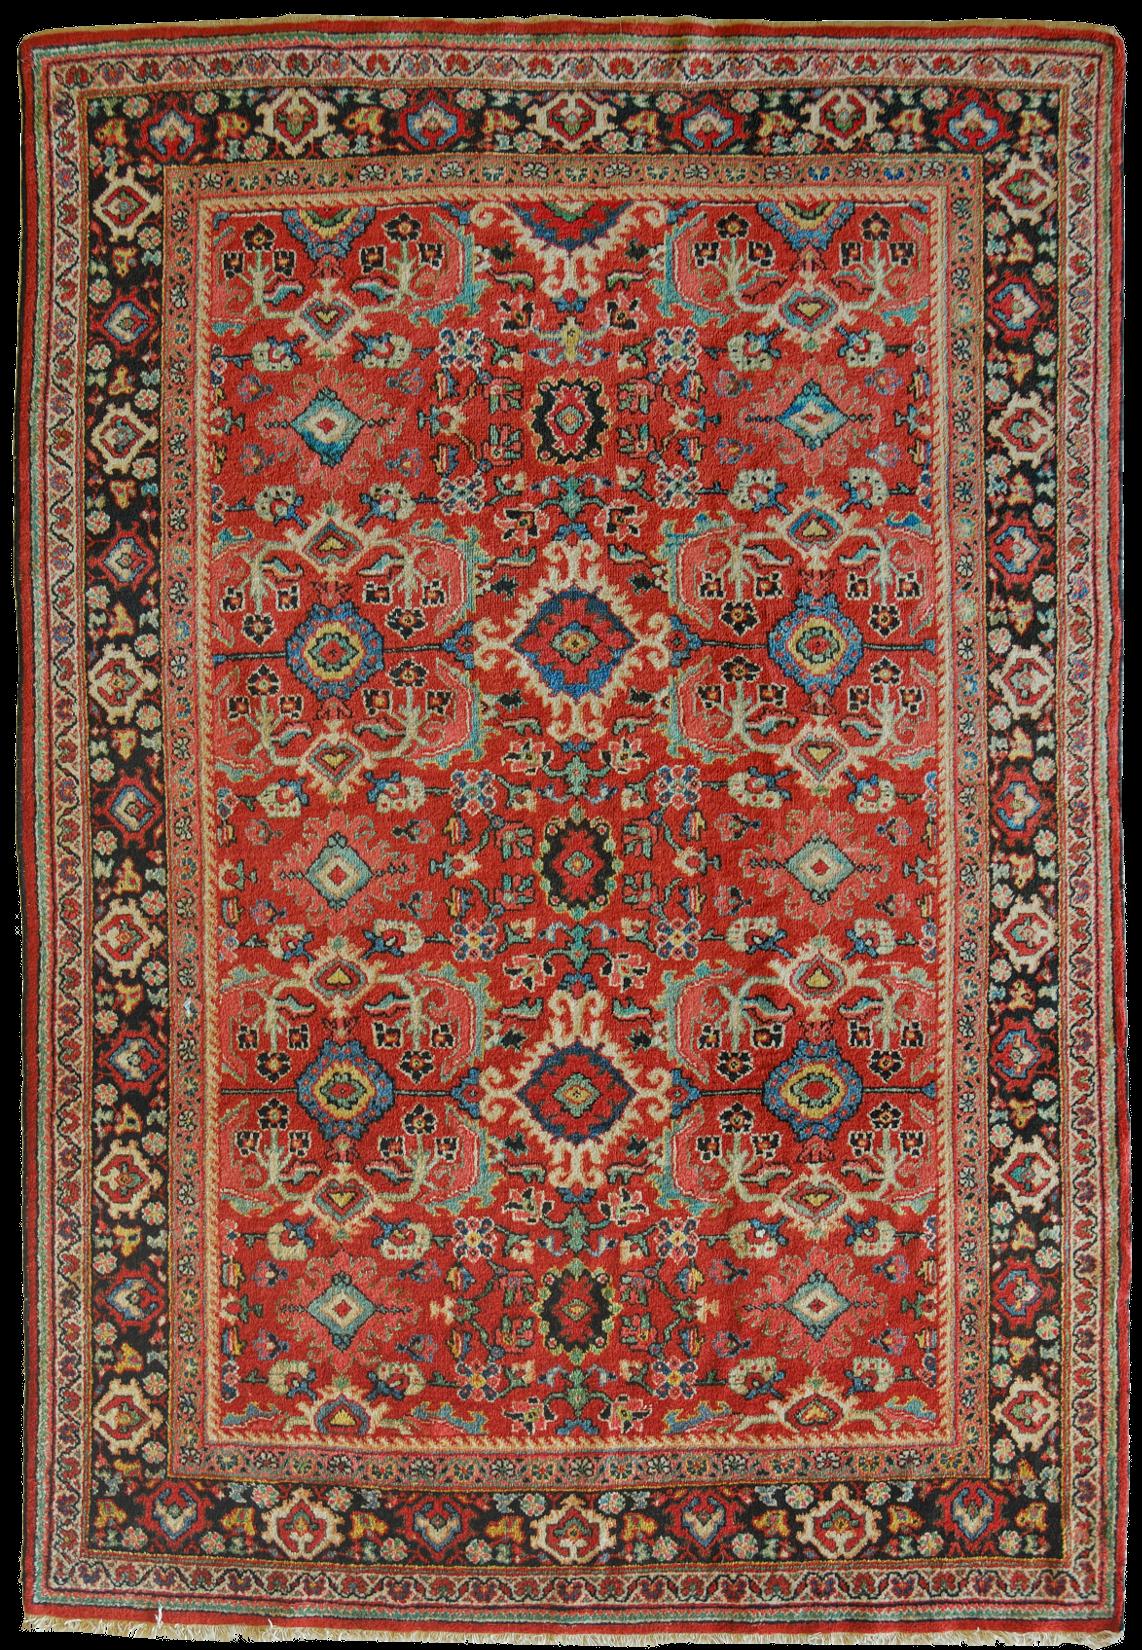 Mahal tappeto persiano